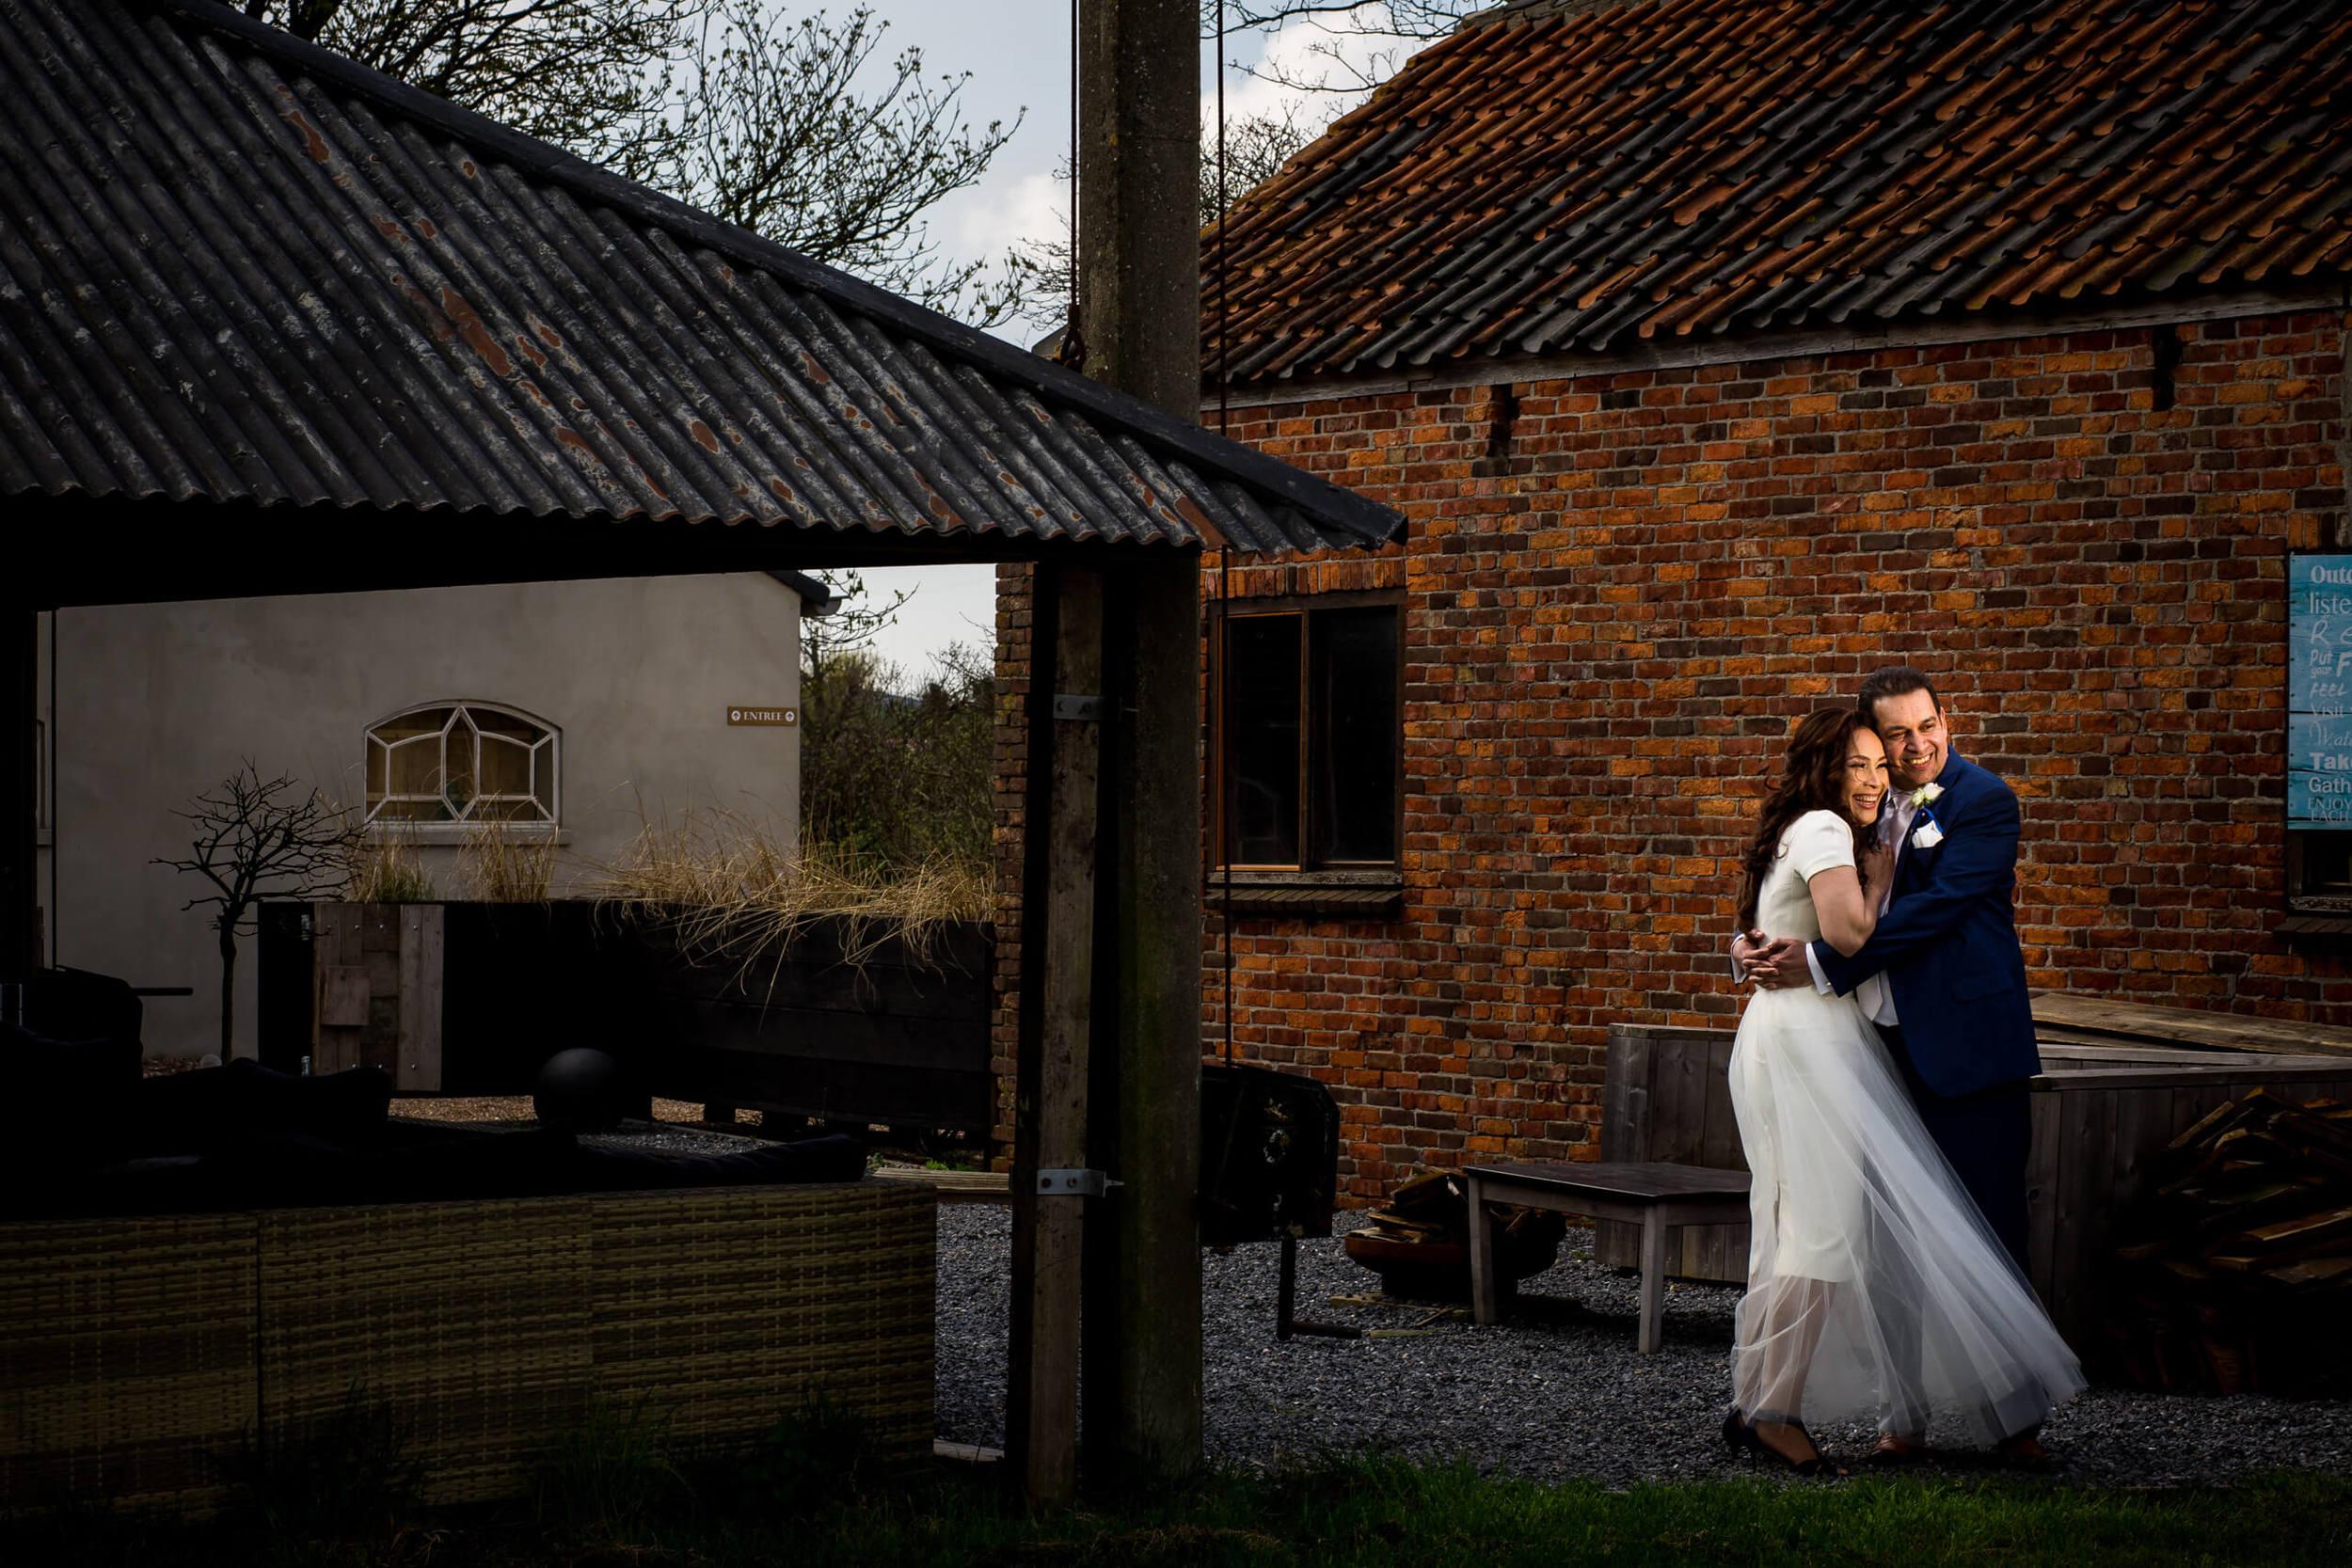 Bruidsfotograaf_Den_Haag_5.jpg